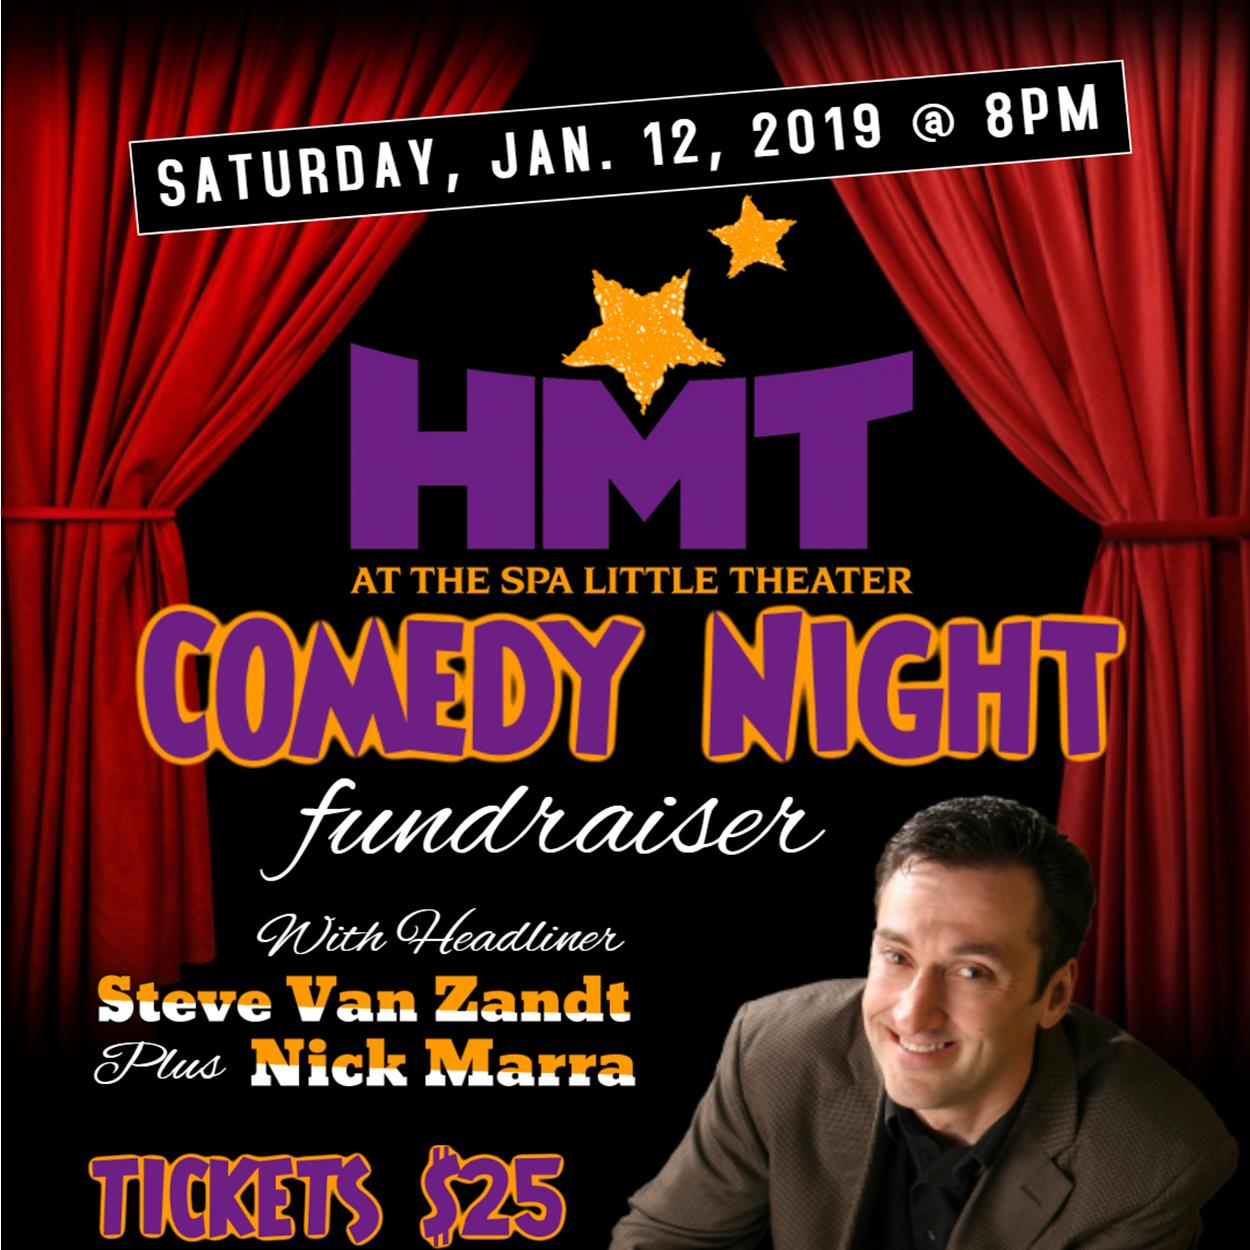 Comedy Night Fundraiser at HMT